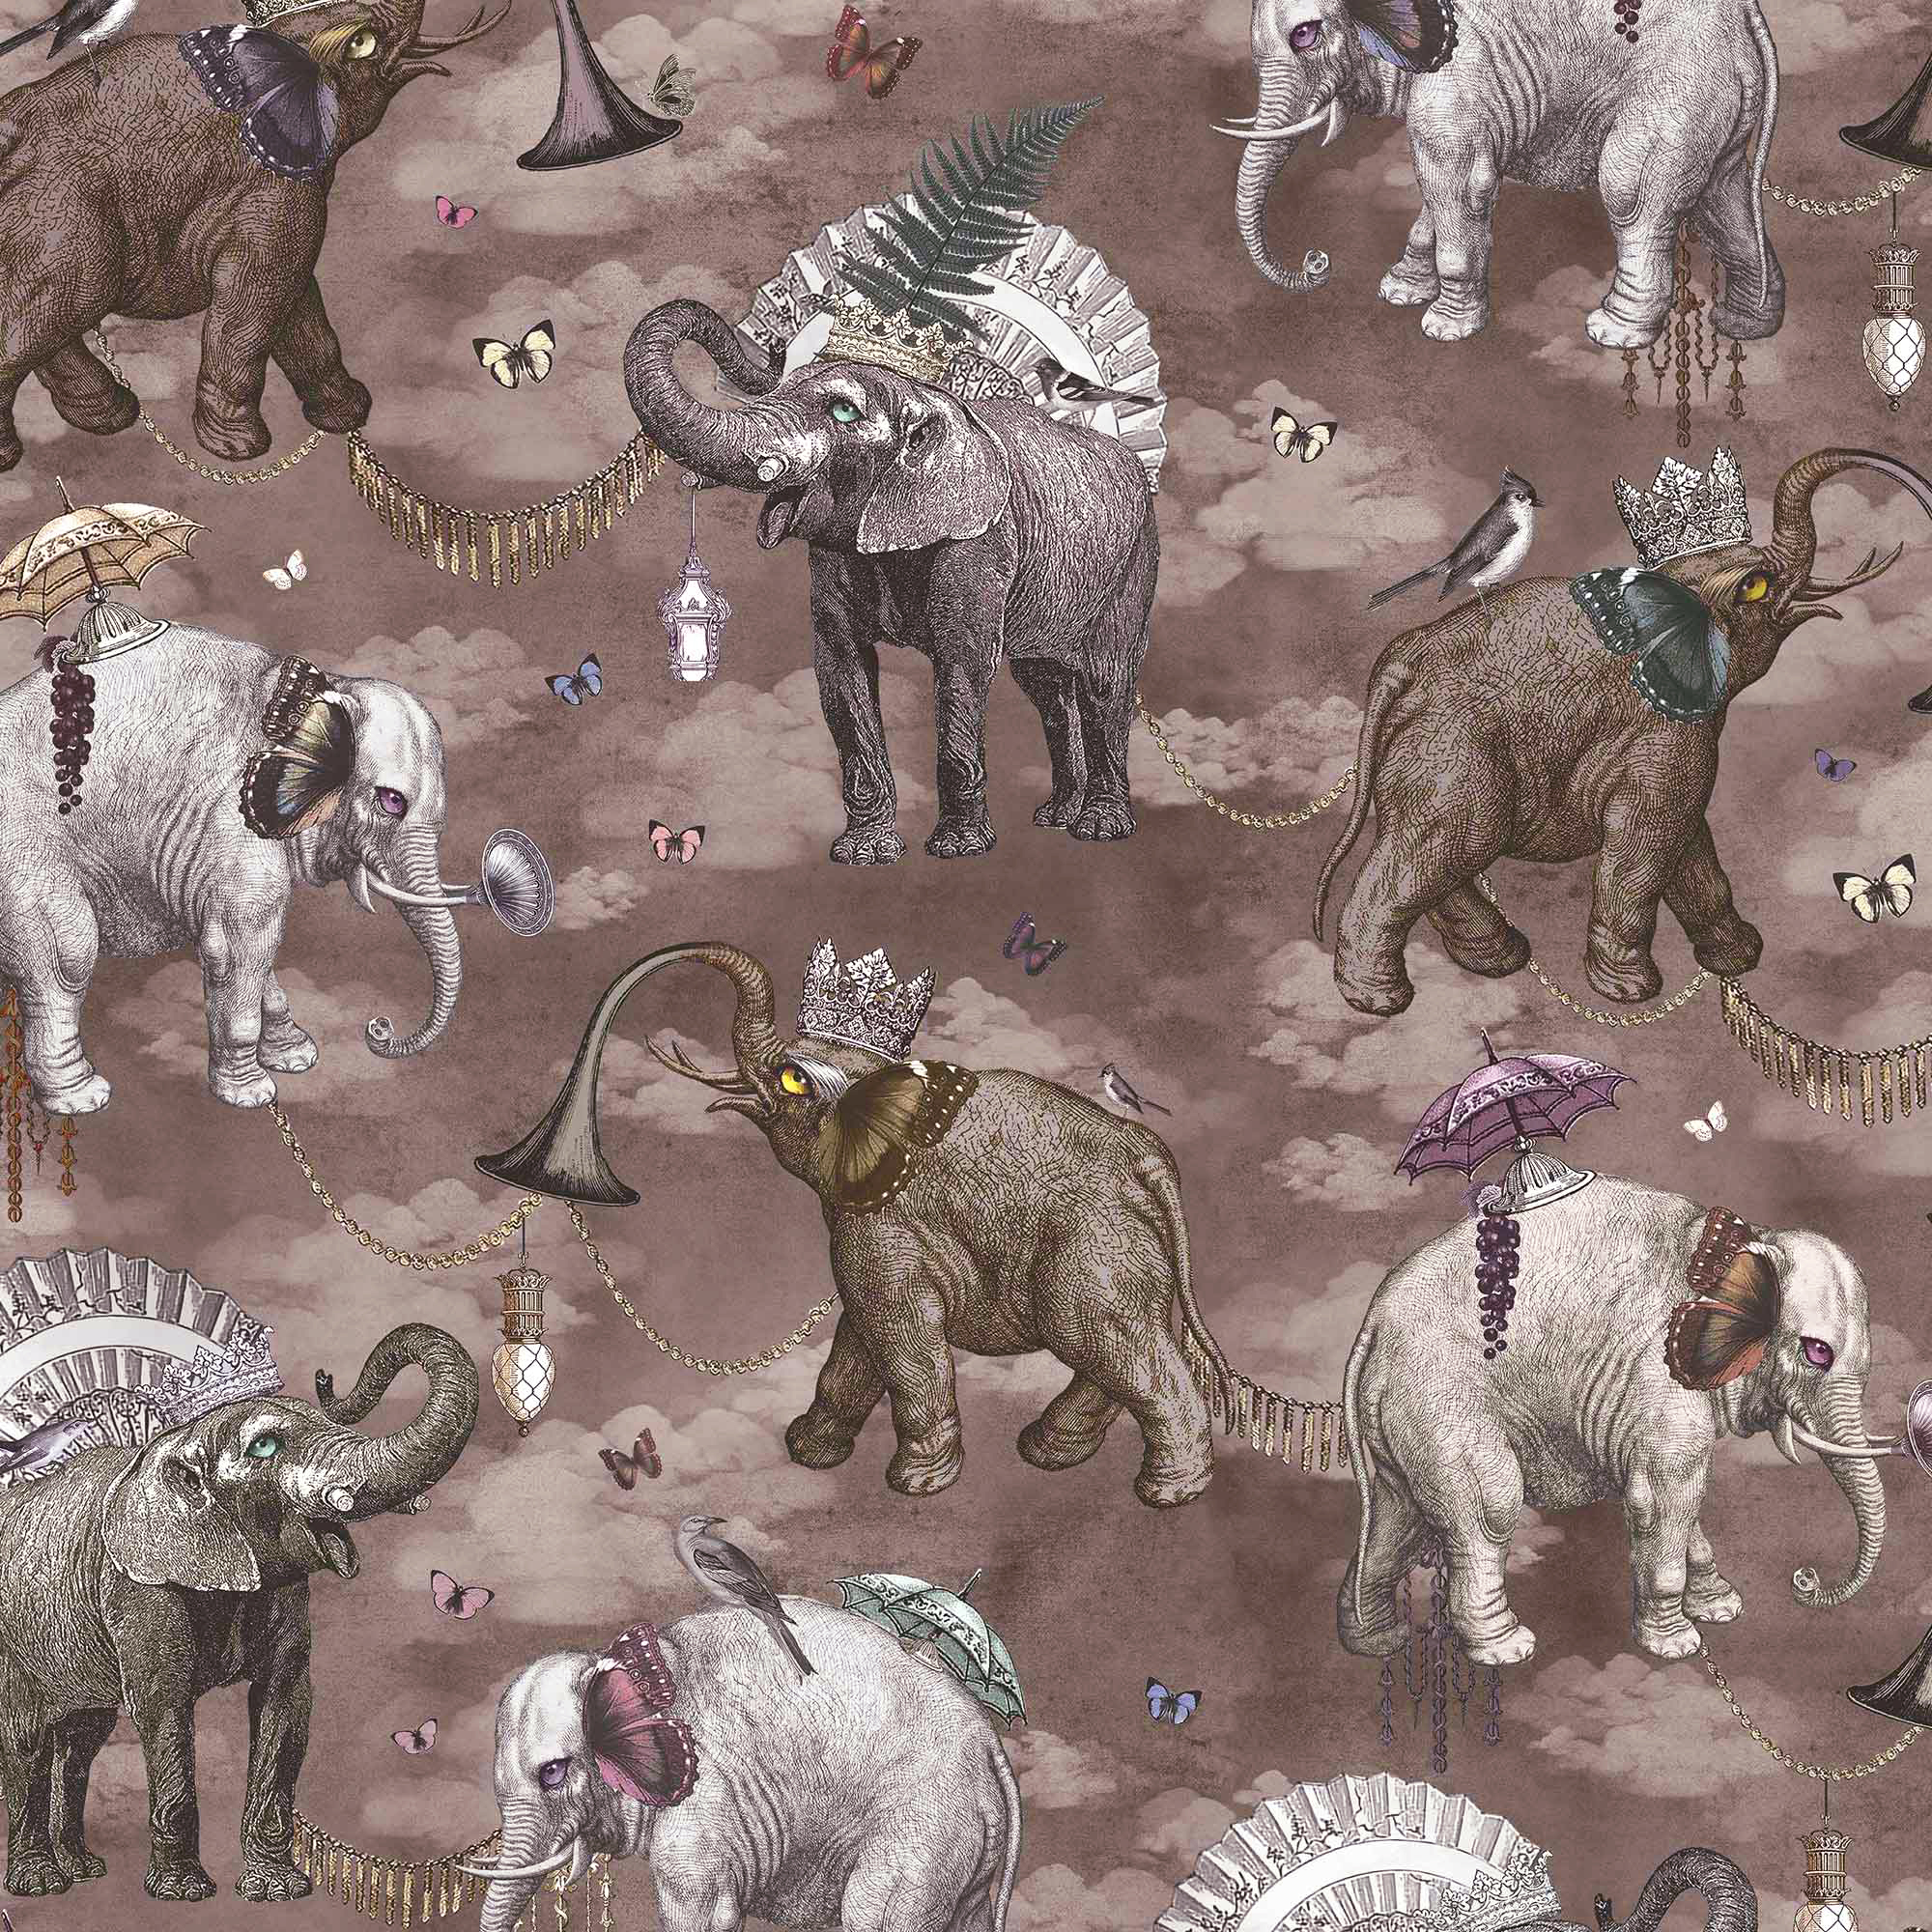 ELEPHANTS MARCH I ARGENTUM